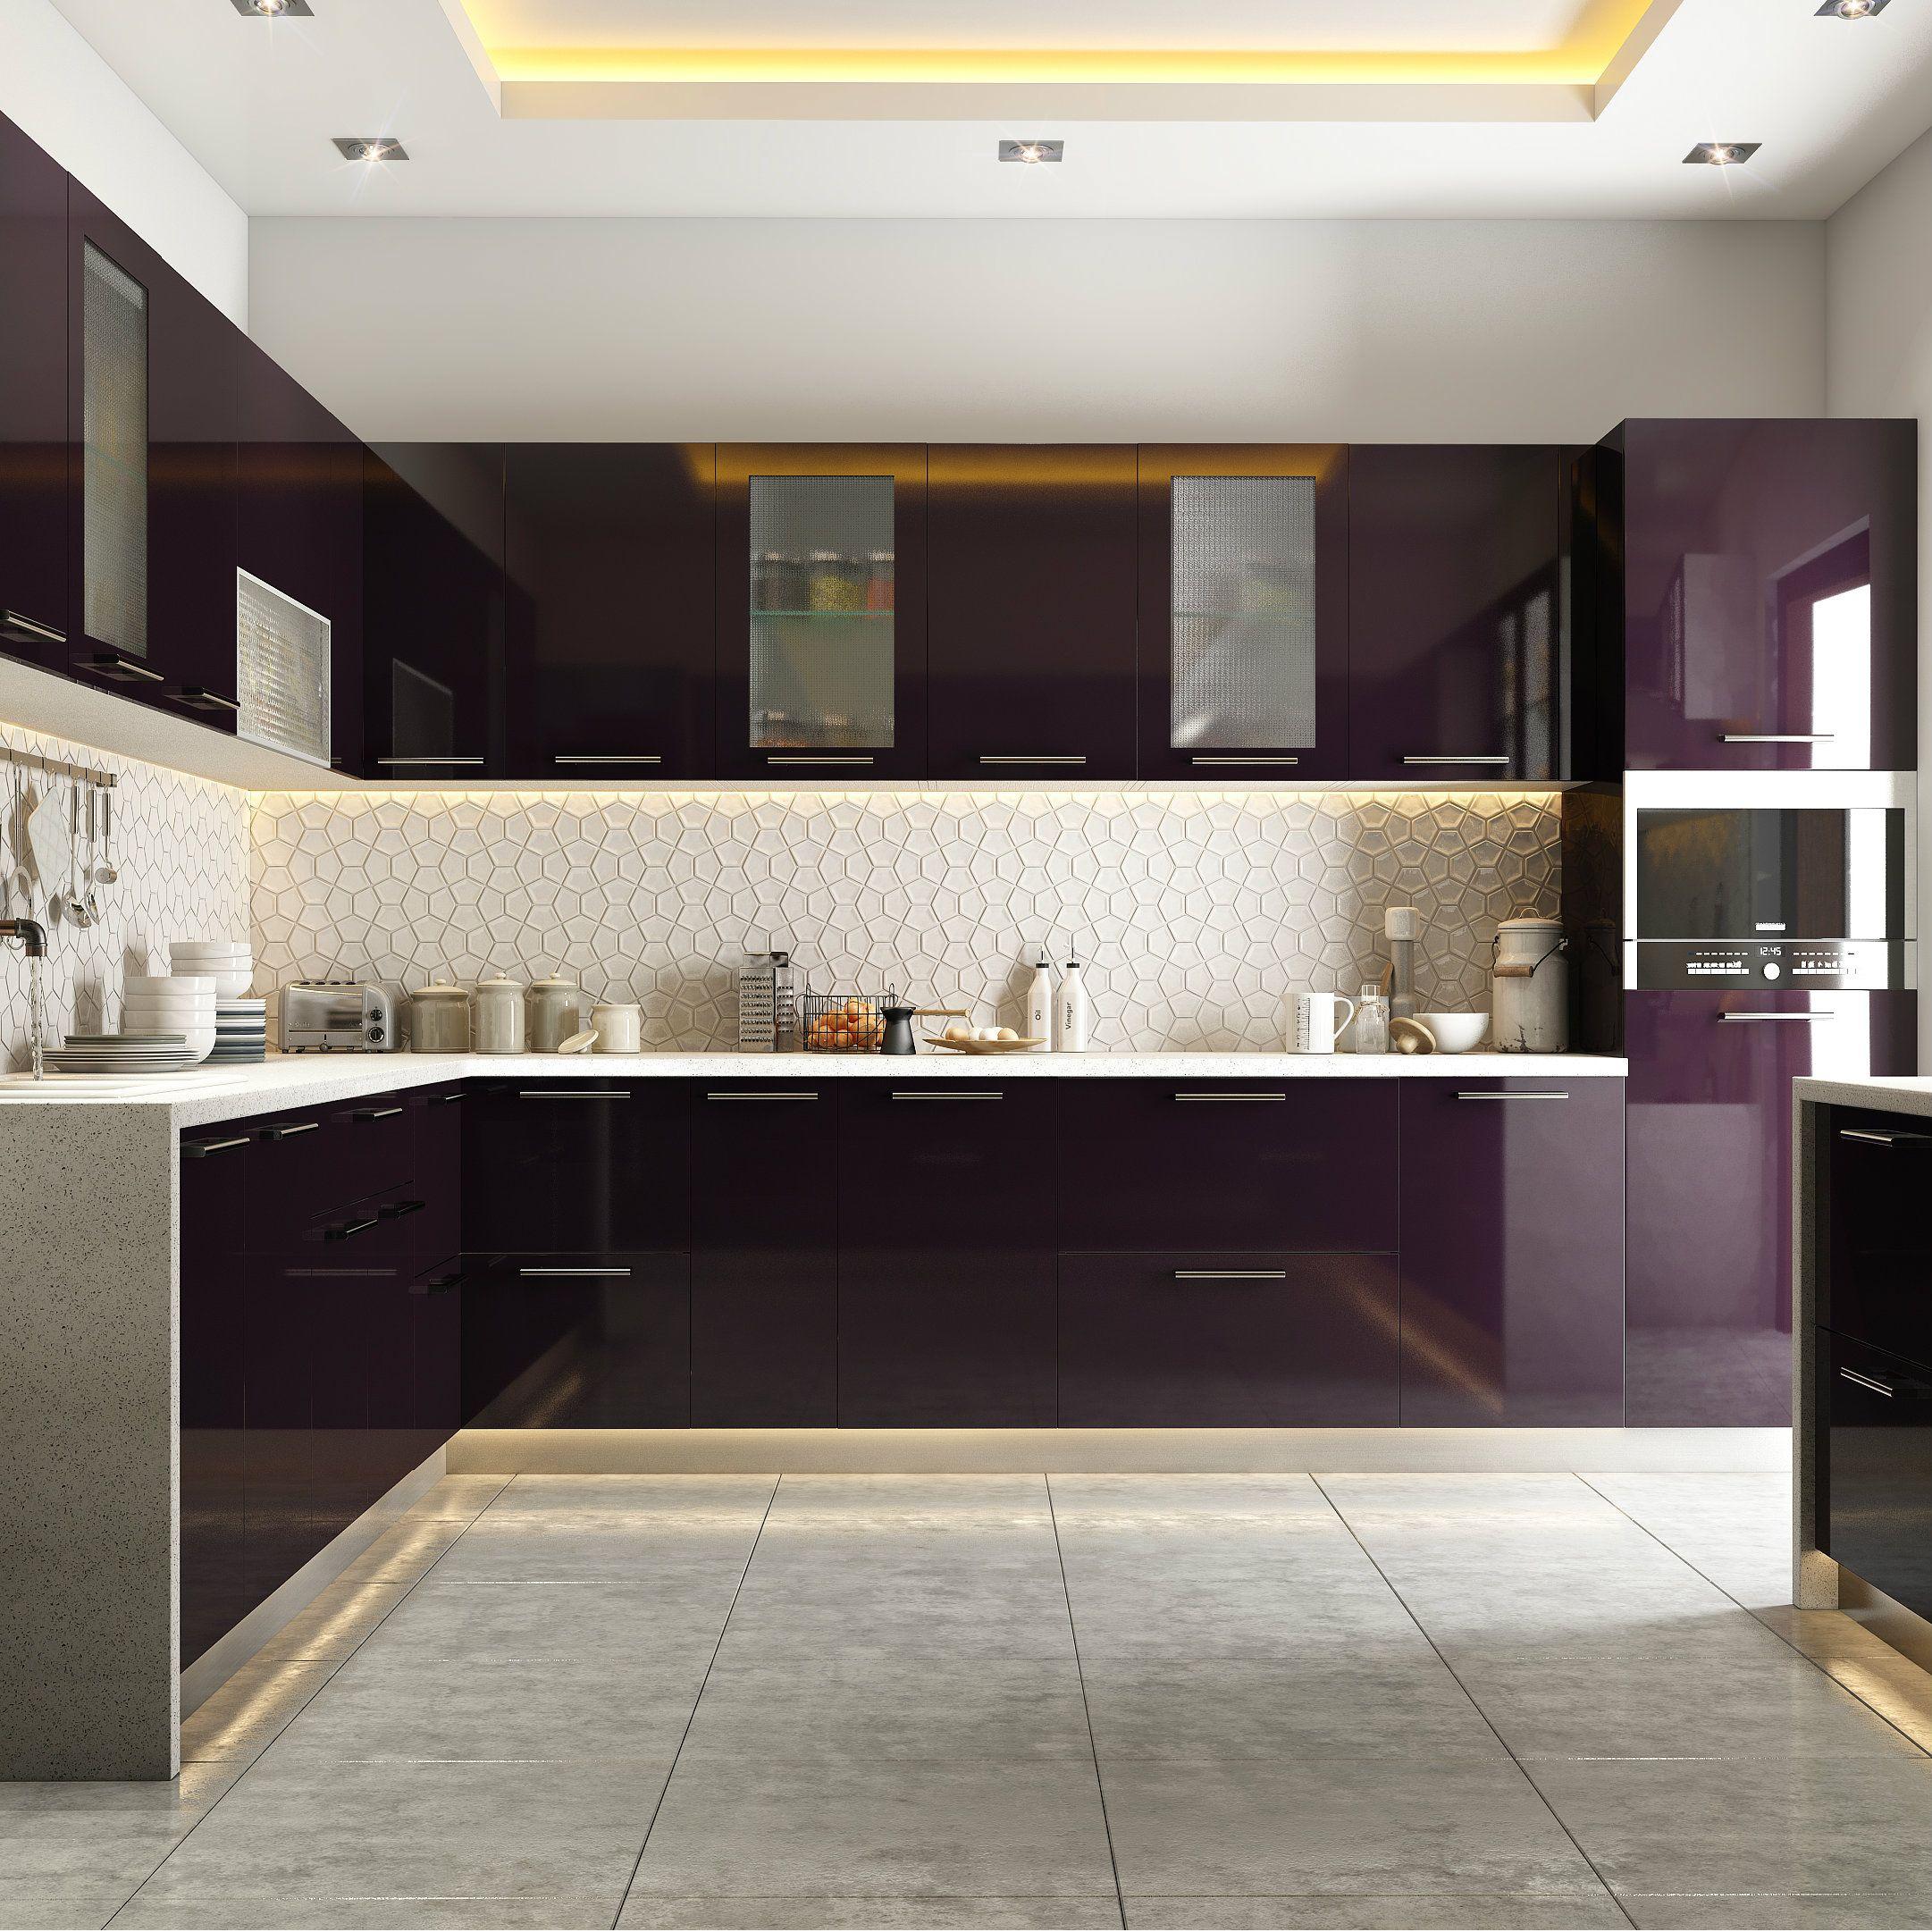 Modular kitchen styled in burgundy hues | Kitchen room ...